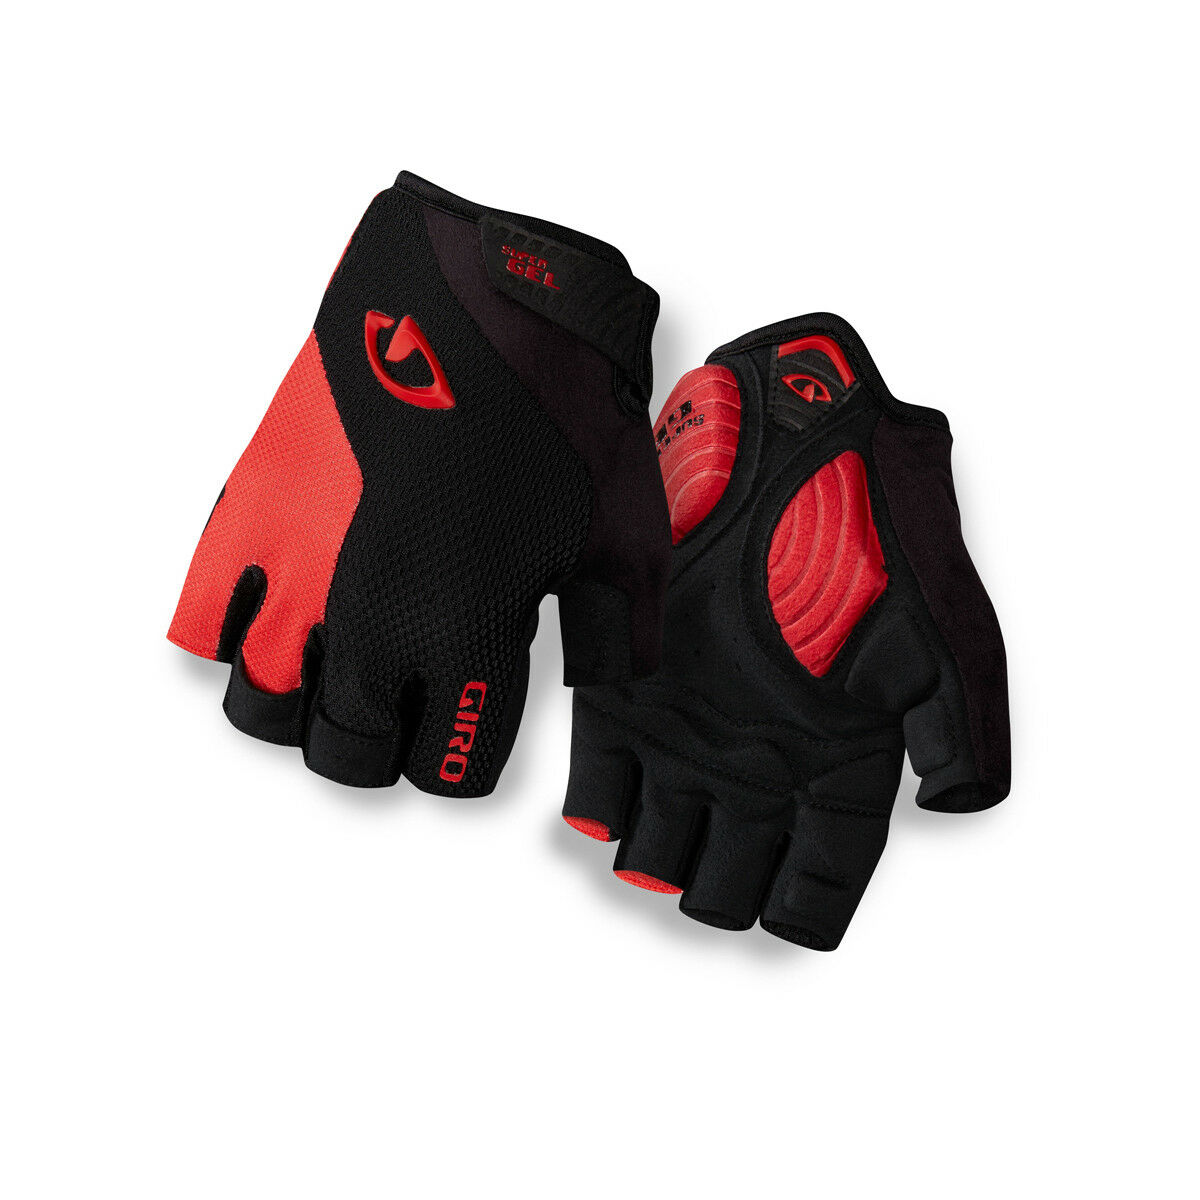 Giro Strade Dure Supergel Fahrrad Handschuhe kurz black red 2019